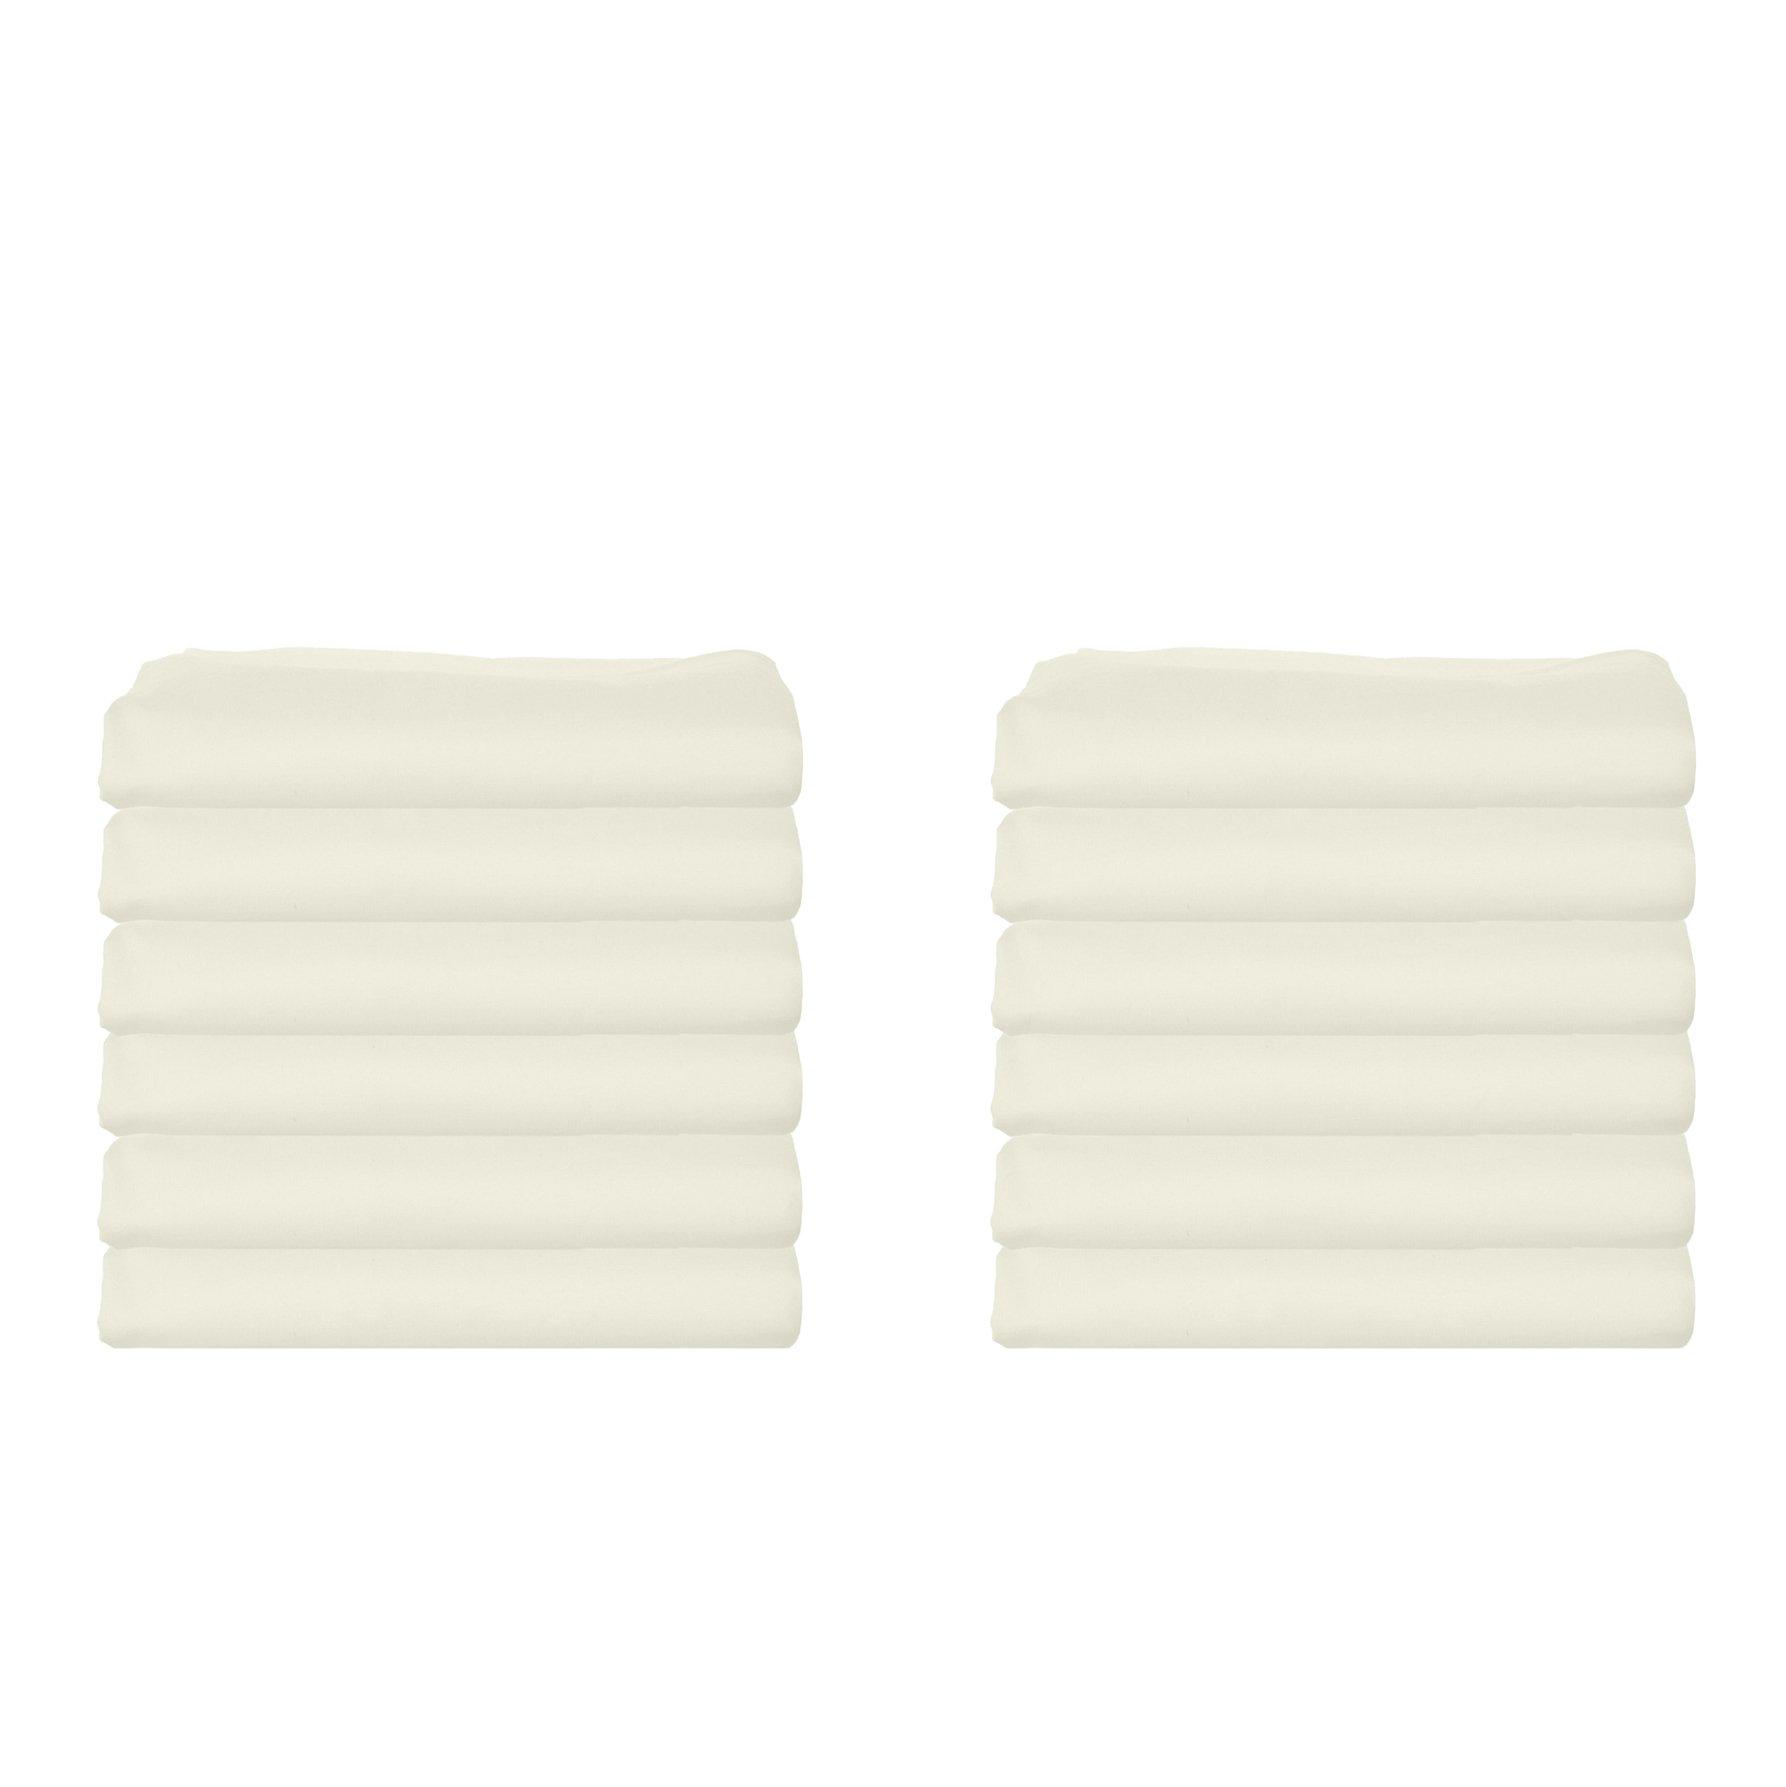 bkb Daycare 12 Piece Portable Crib Sheets, Ecru